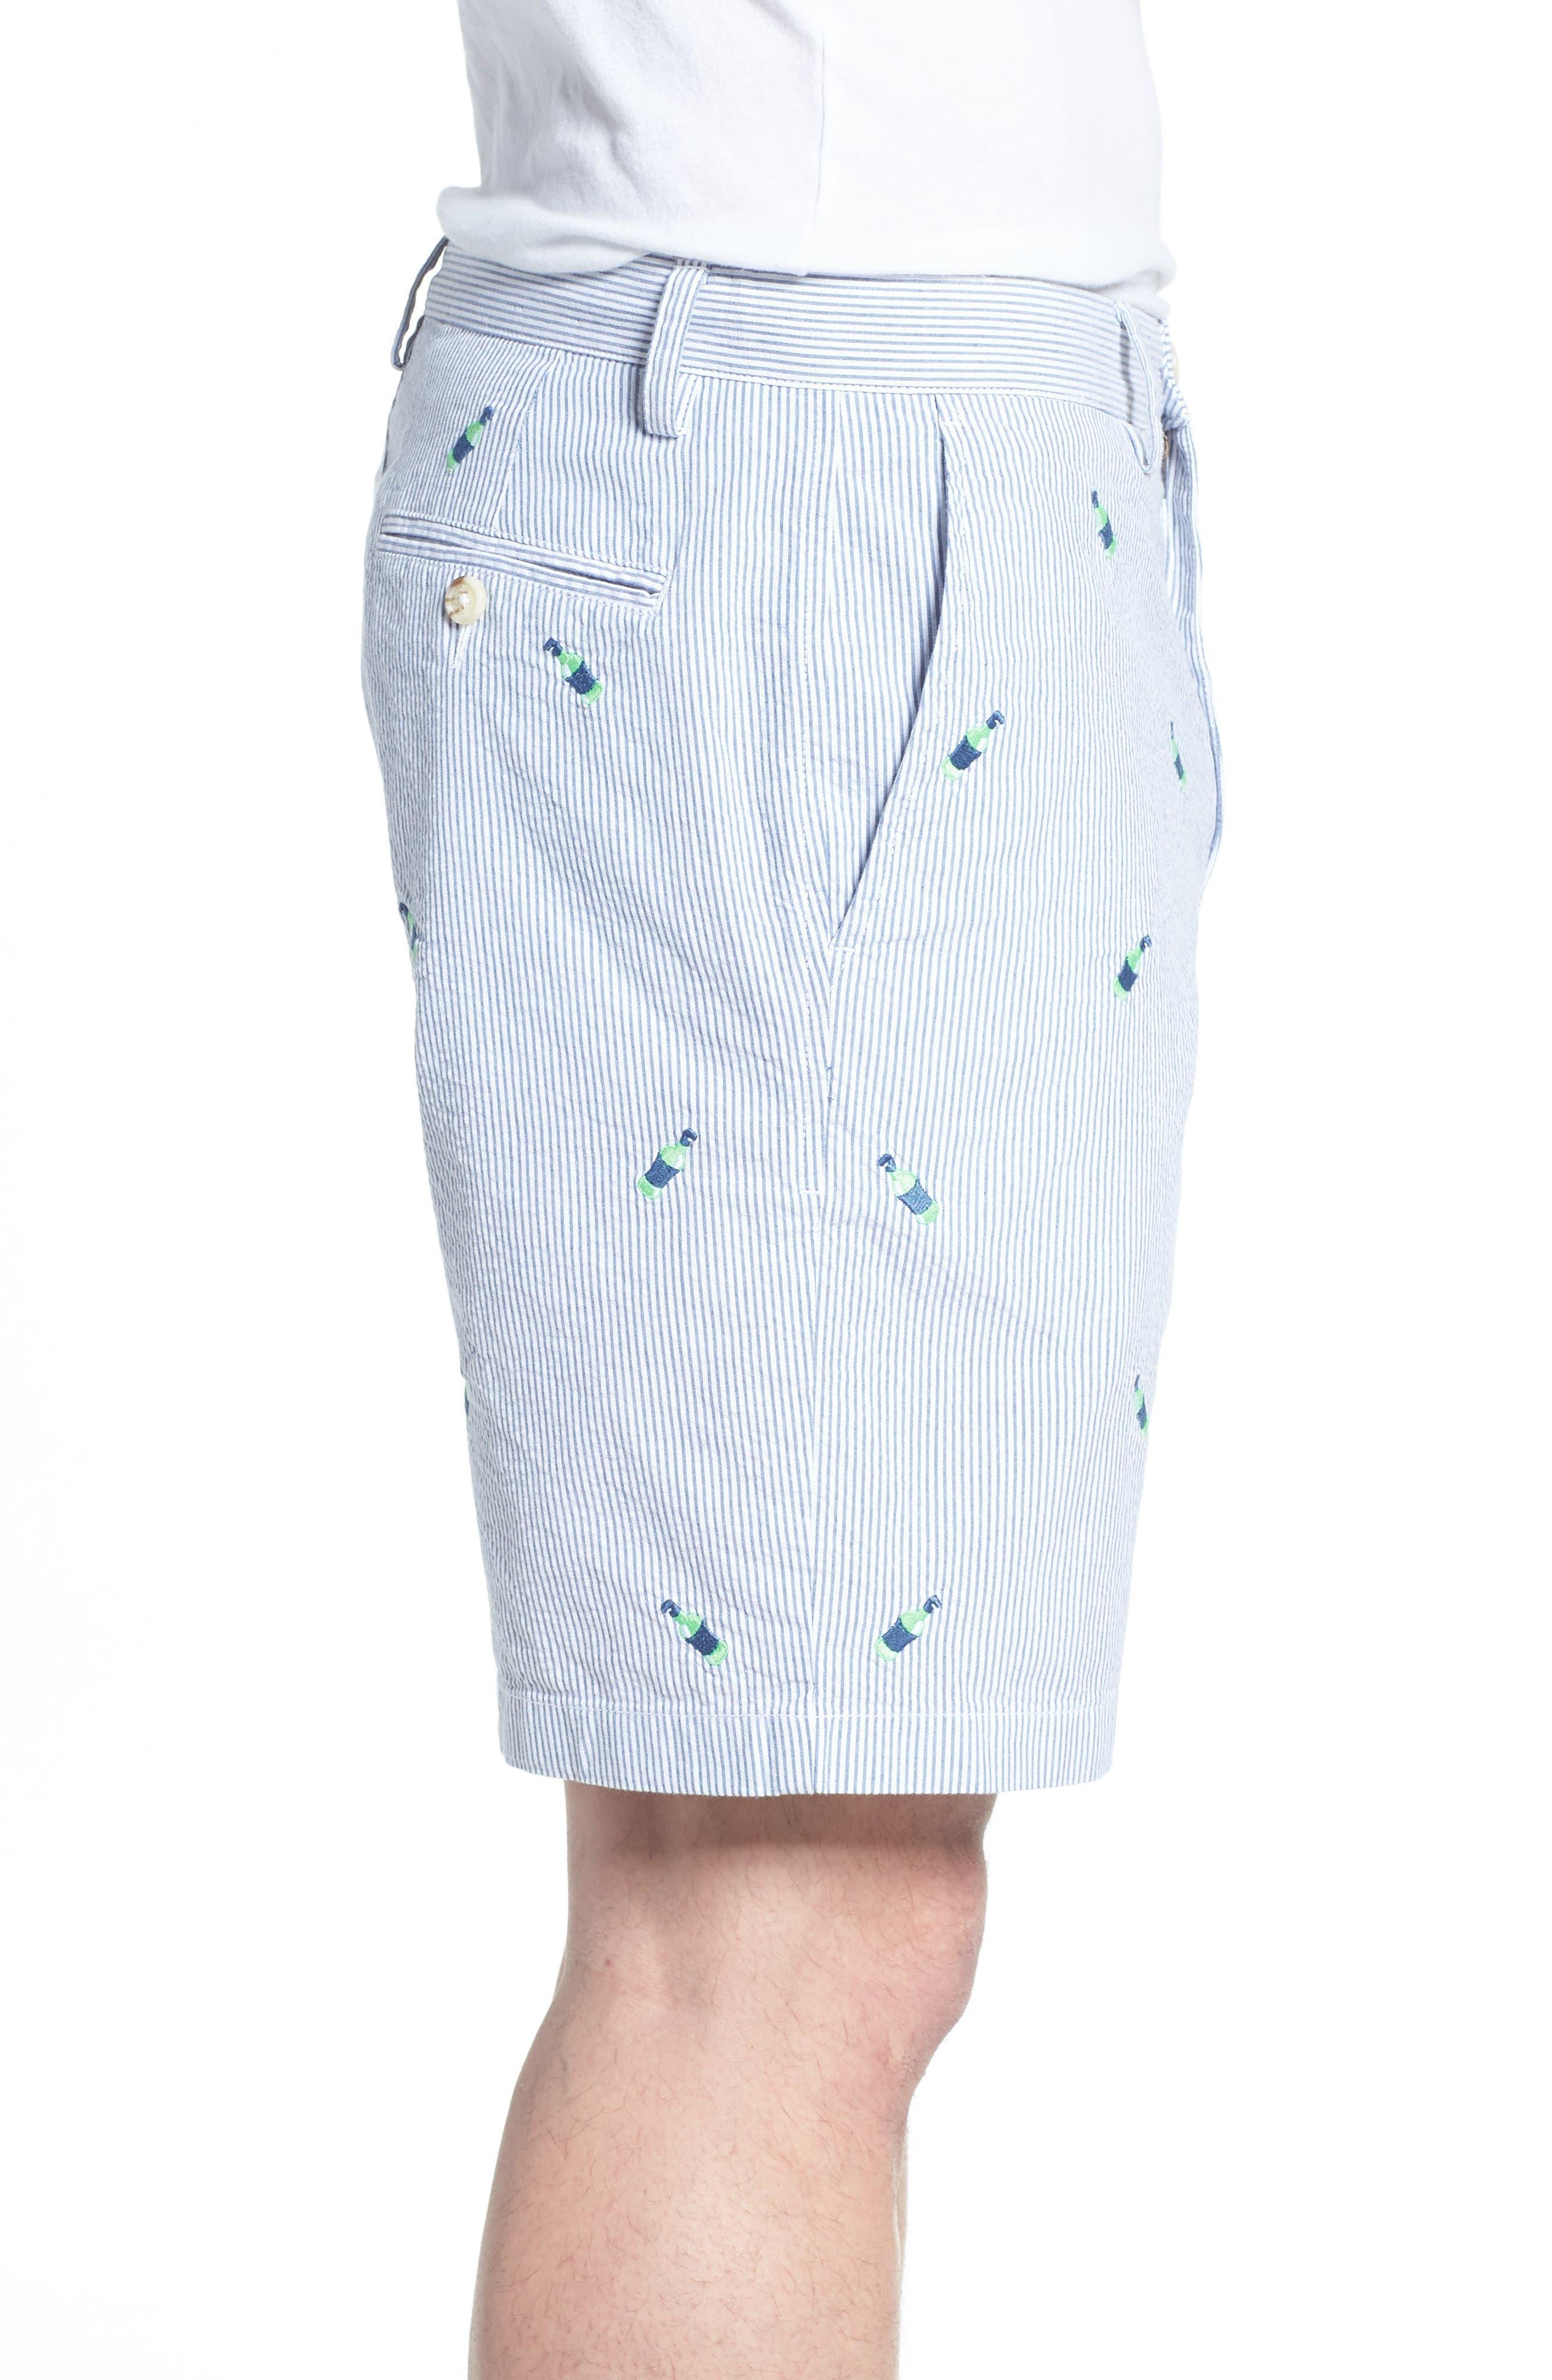 Embroidered Seersucker Shorts,                             Alternate thumbnail 3, color,                             Seven Seas Blue